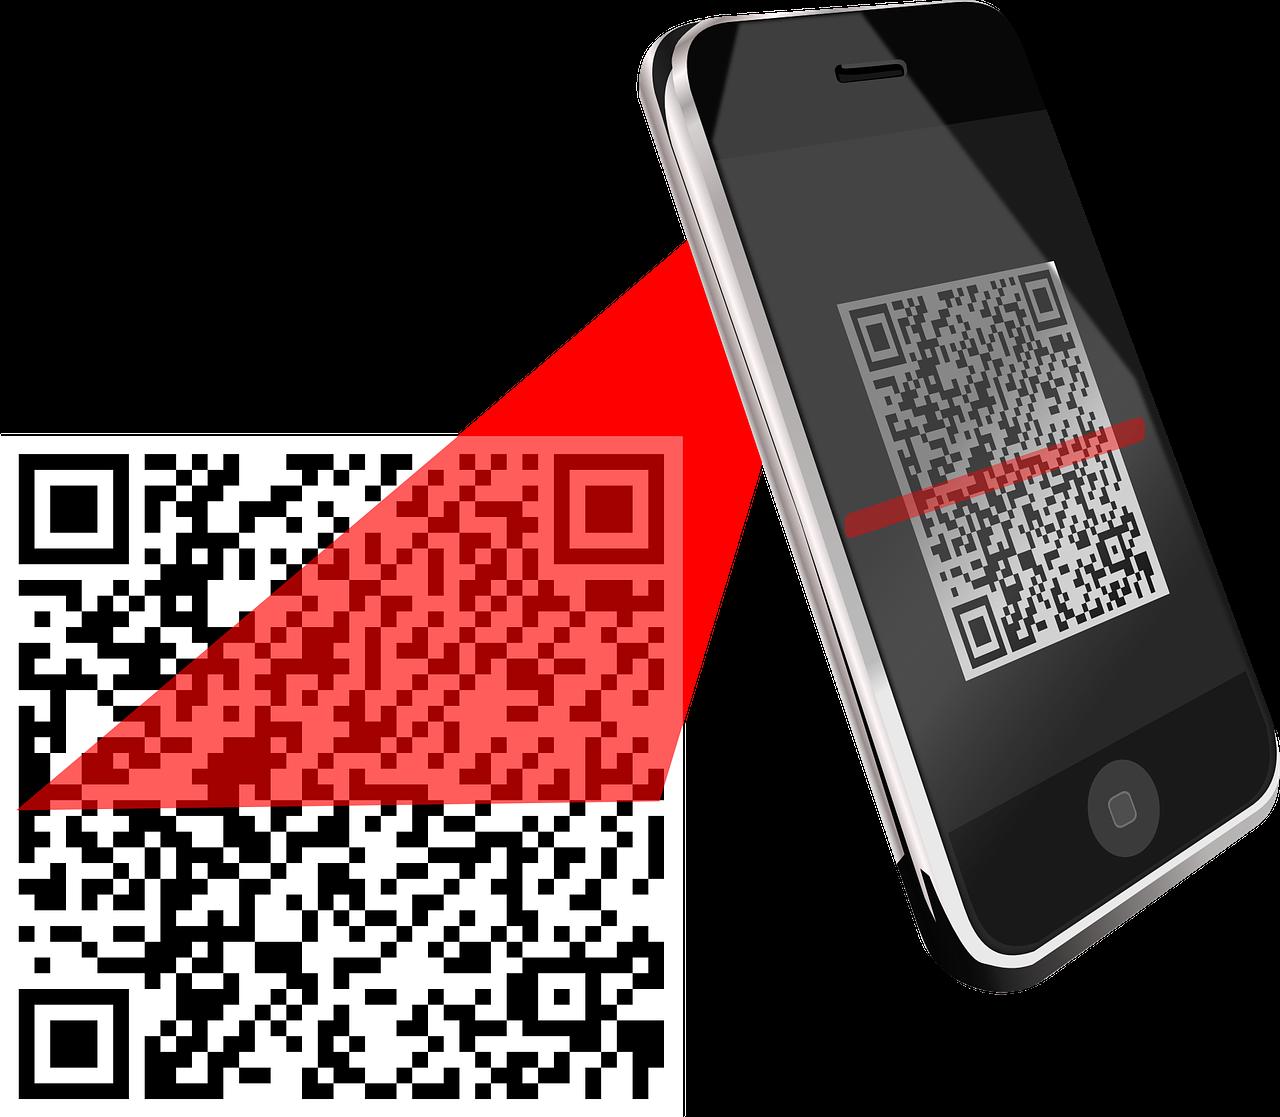 qr-code-156717_1280.png